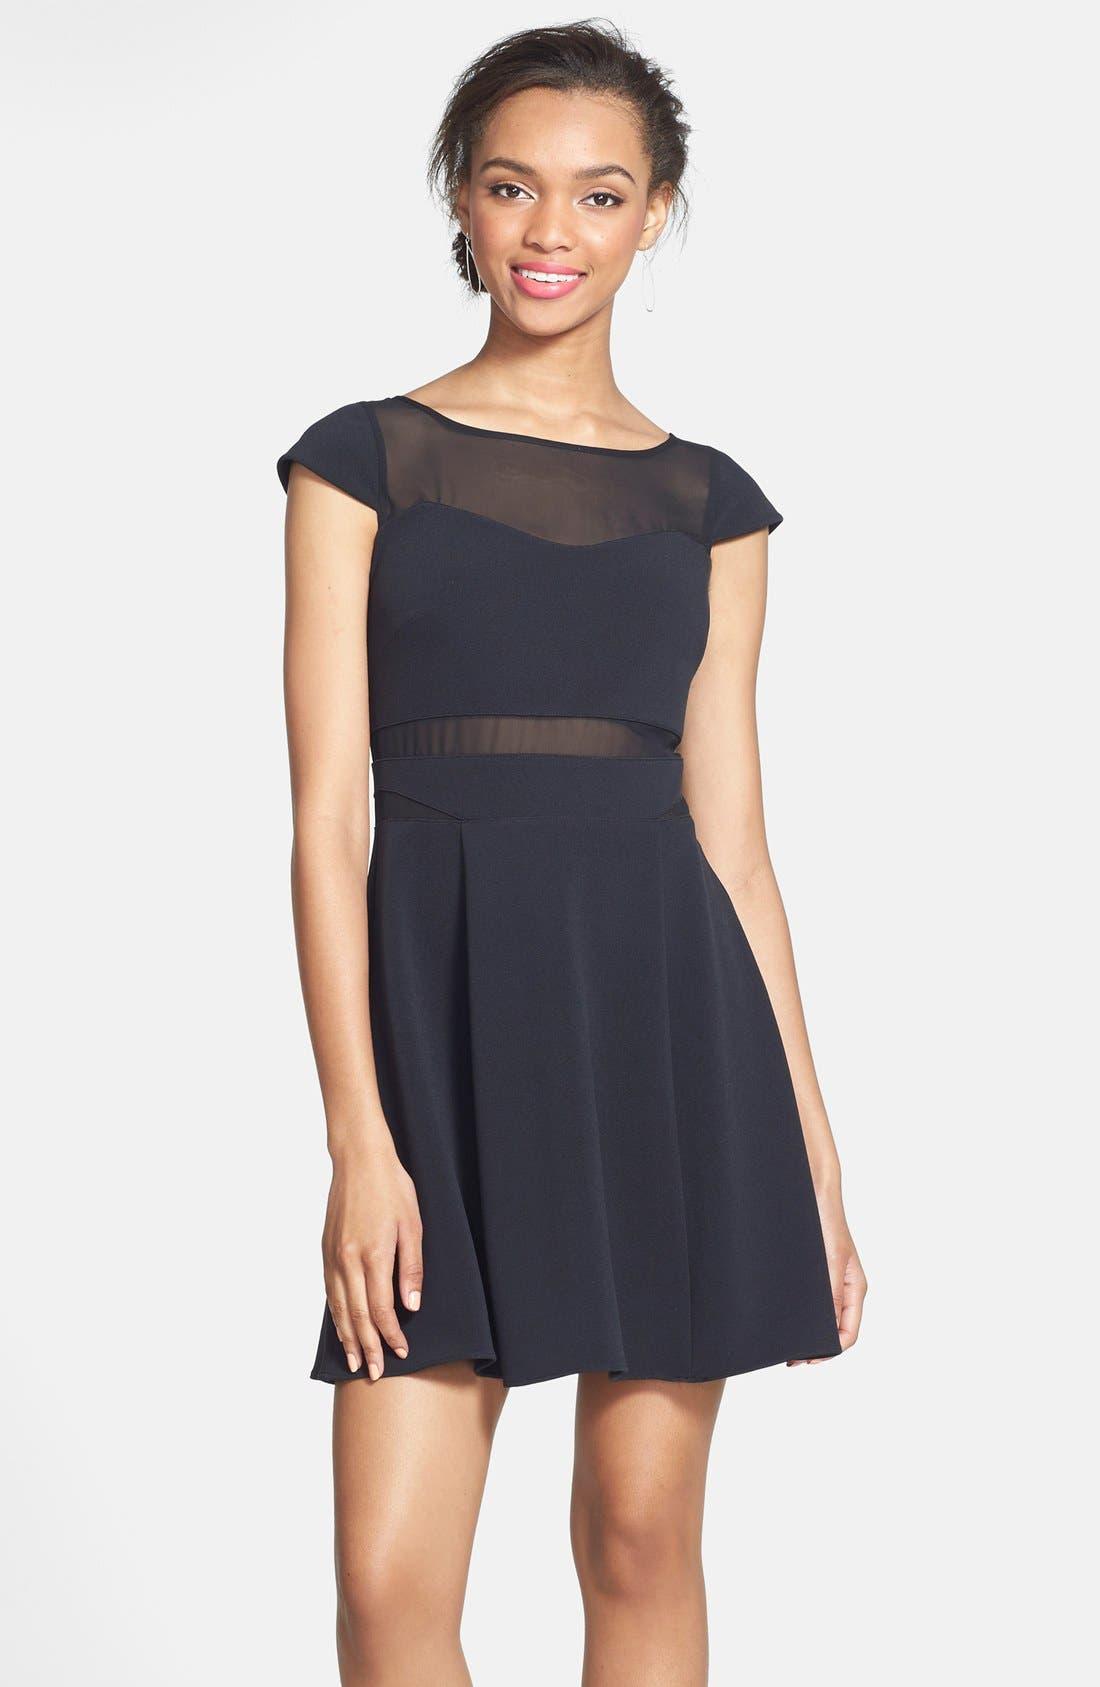 HAILEY LOGAN Mesh Inset Skater Dress, Main, color, 001